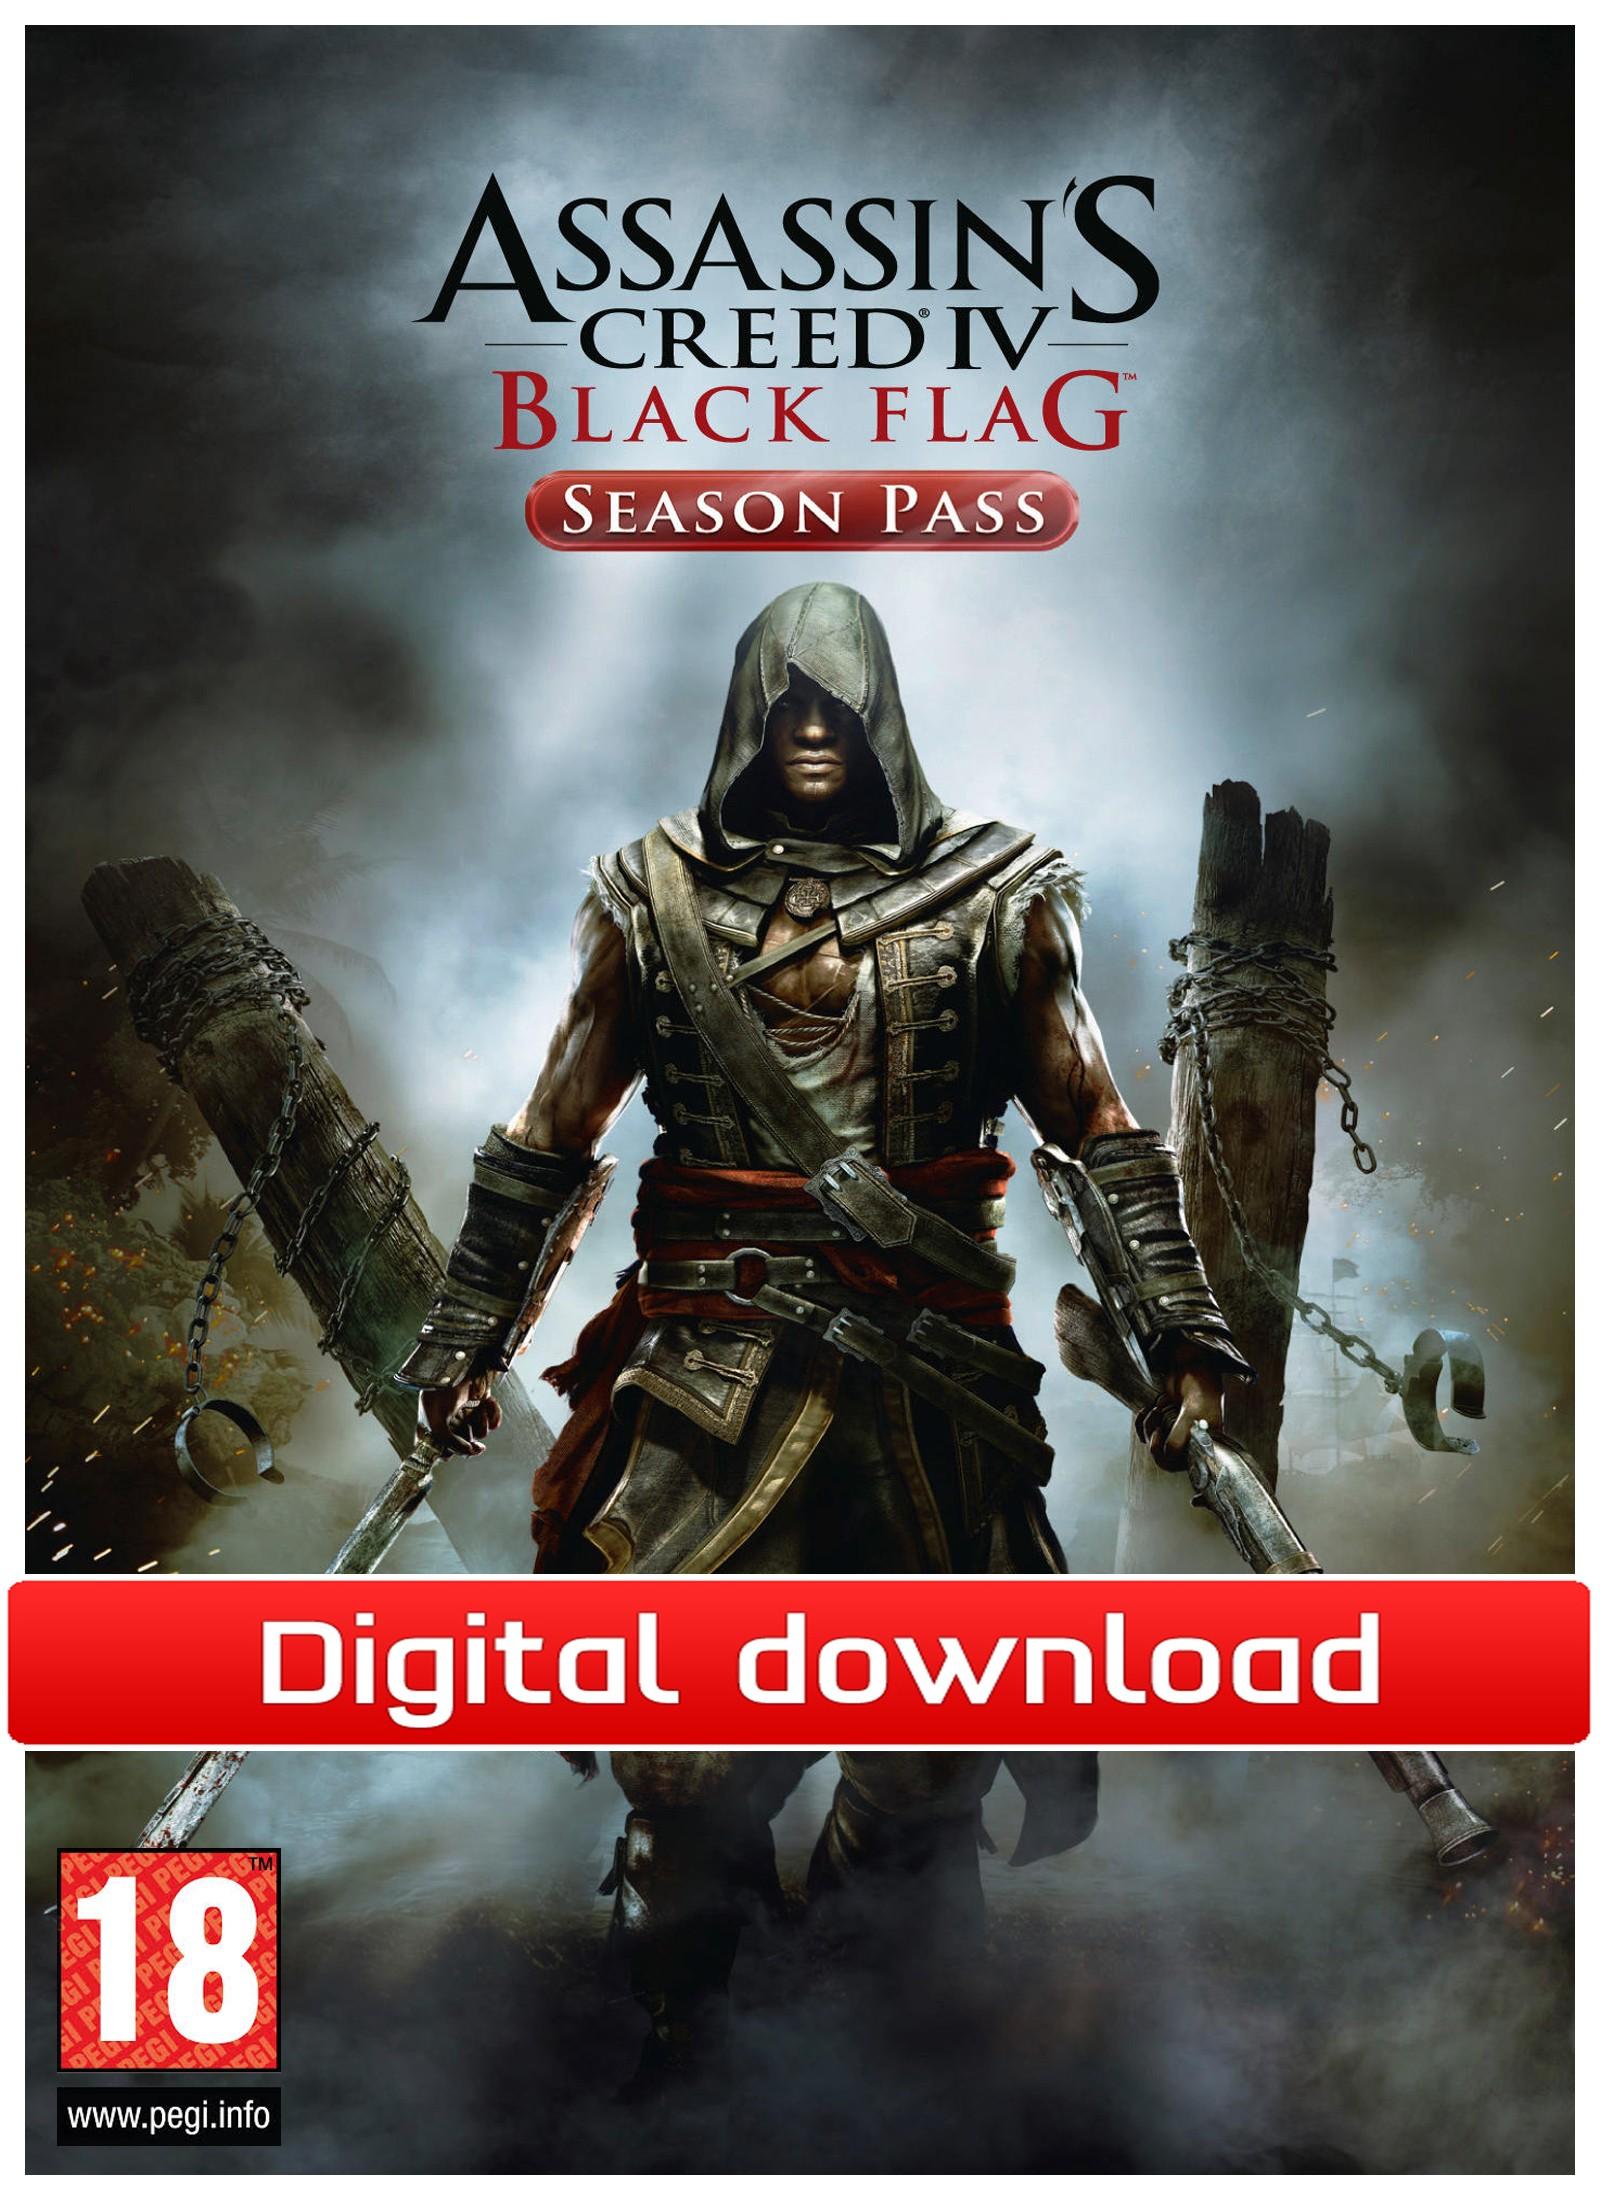 33854 : Assassin?s Creed IV: Black Flag Season Pass (PC nedl)